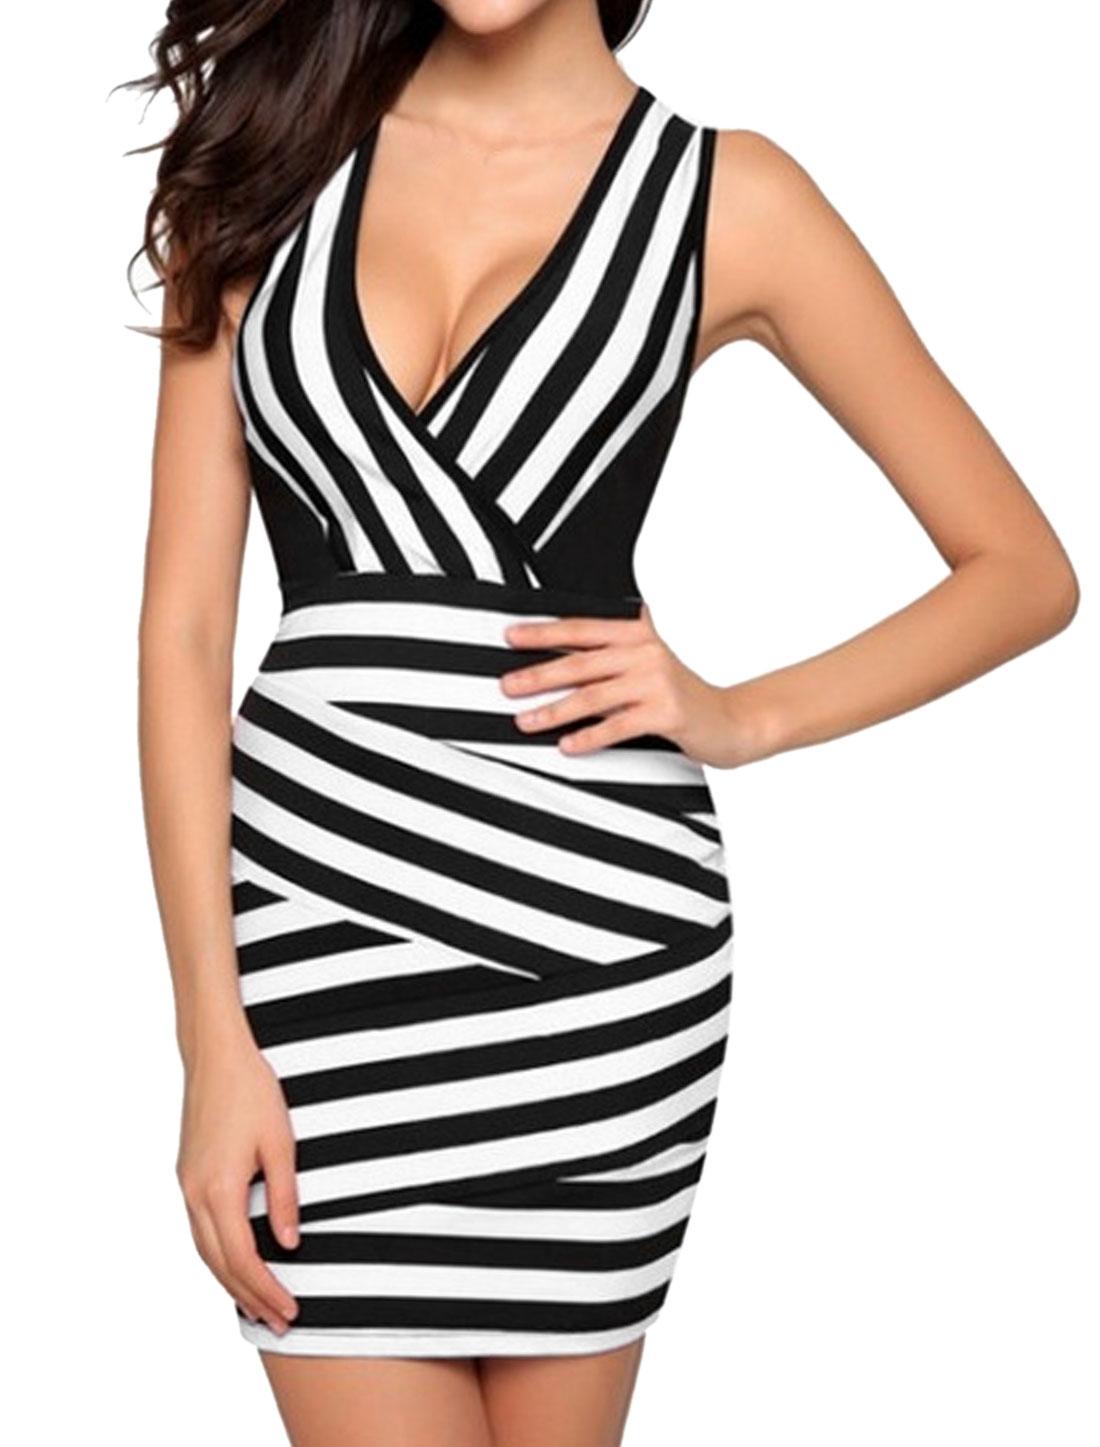 Women Crossover V Neck Stripes Sleeveless Sheath Dress Black L